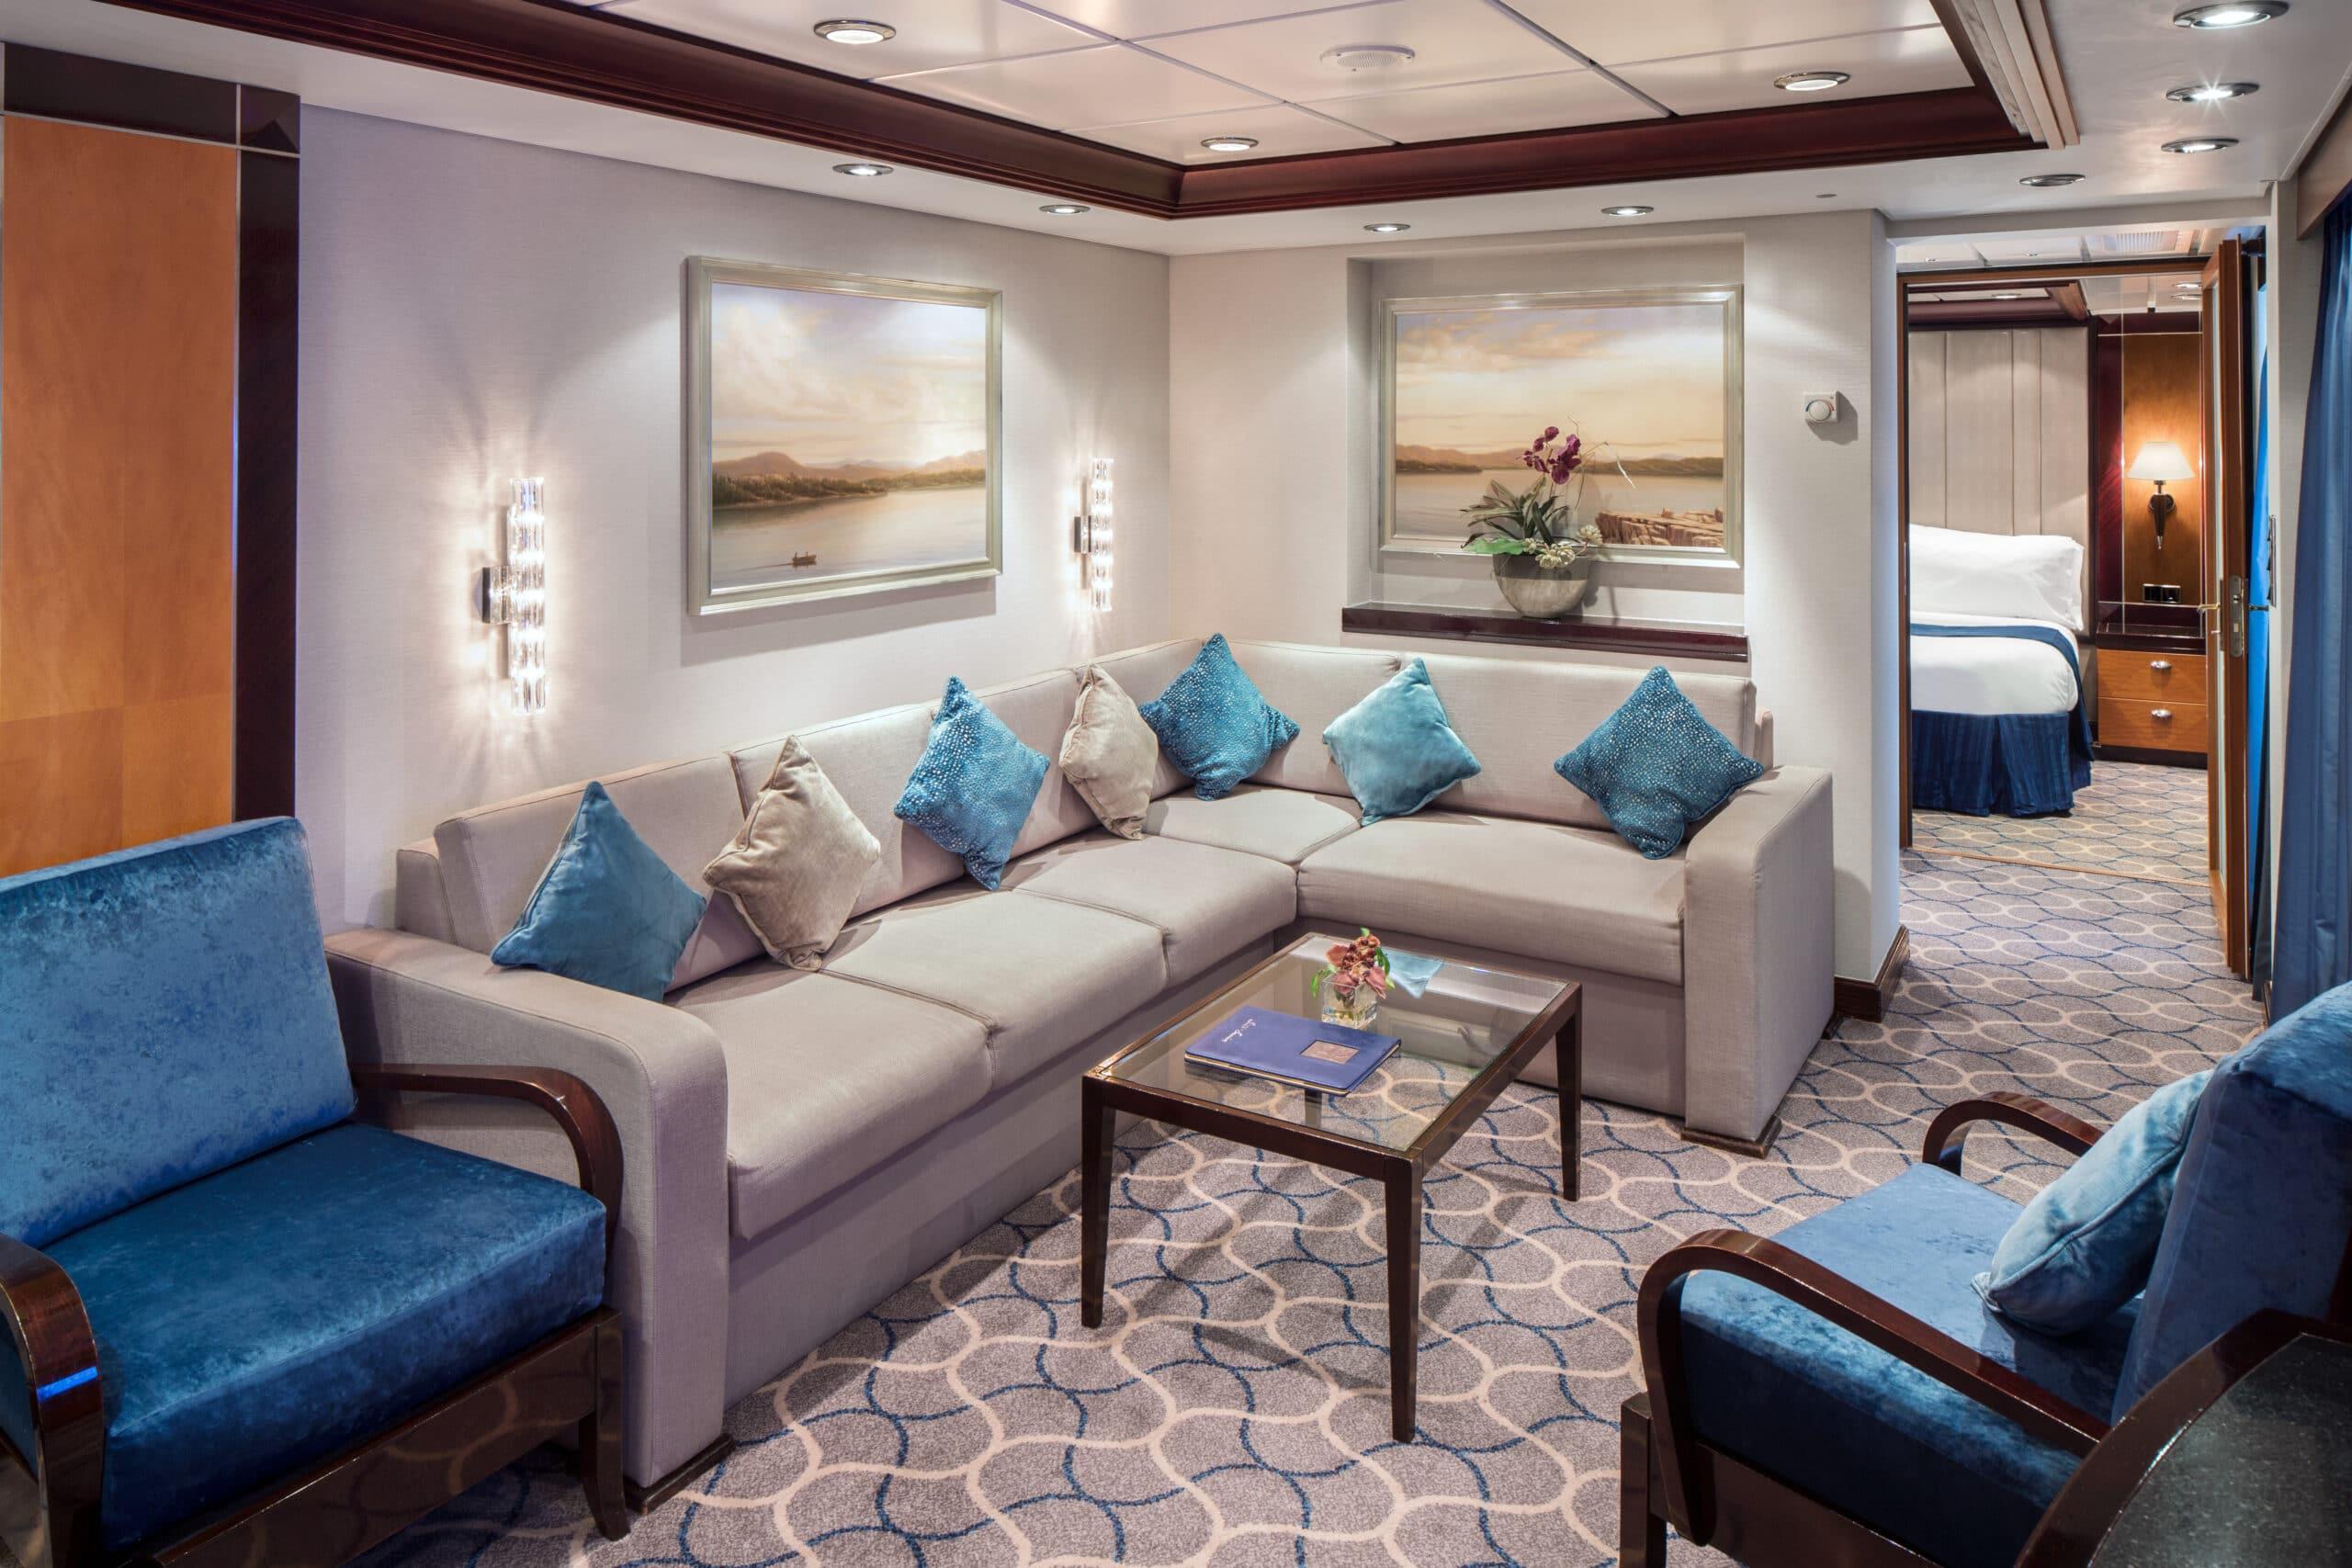 Royal-Caribbean-International-Freedom-of-the-Seas-Liberty-of-the-Seas-schip-cruiseschip-categorie-VS-Villa-Suite